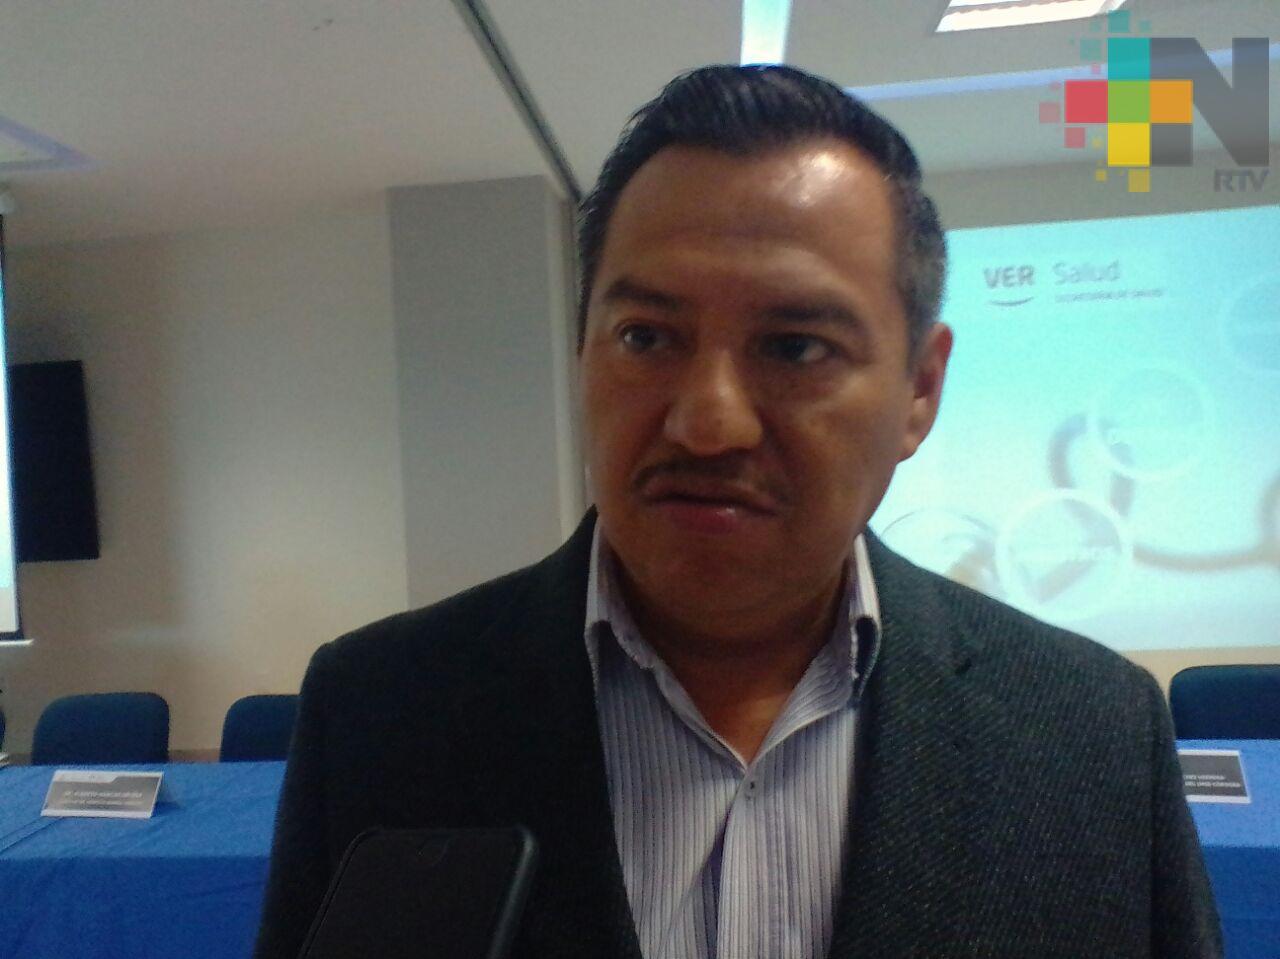 Municipios de la zona centro piden apoyo para recibir recursos del Fortaseg